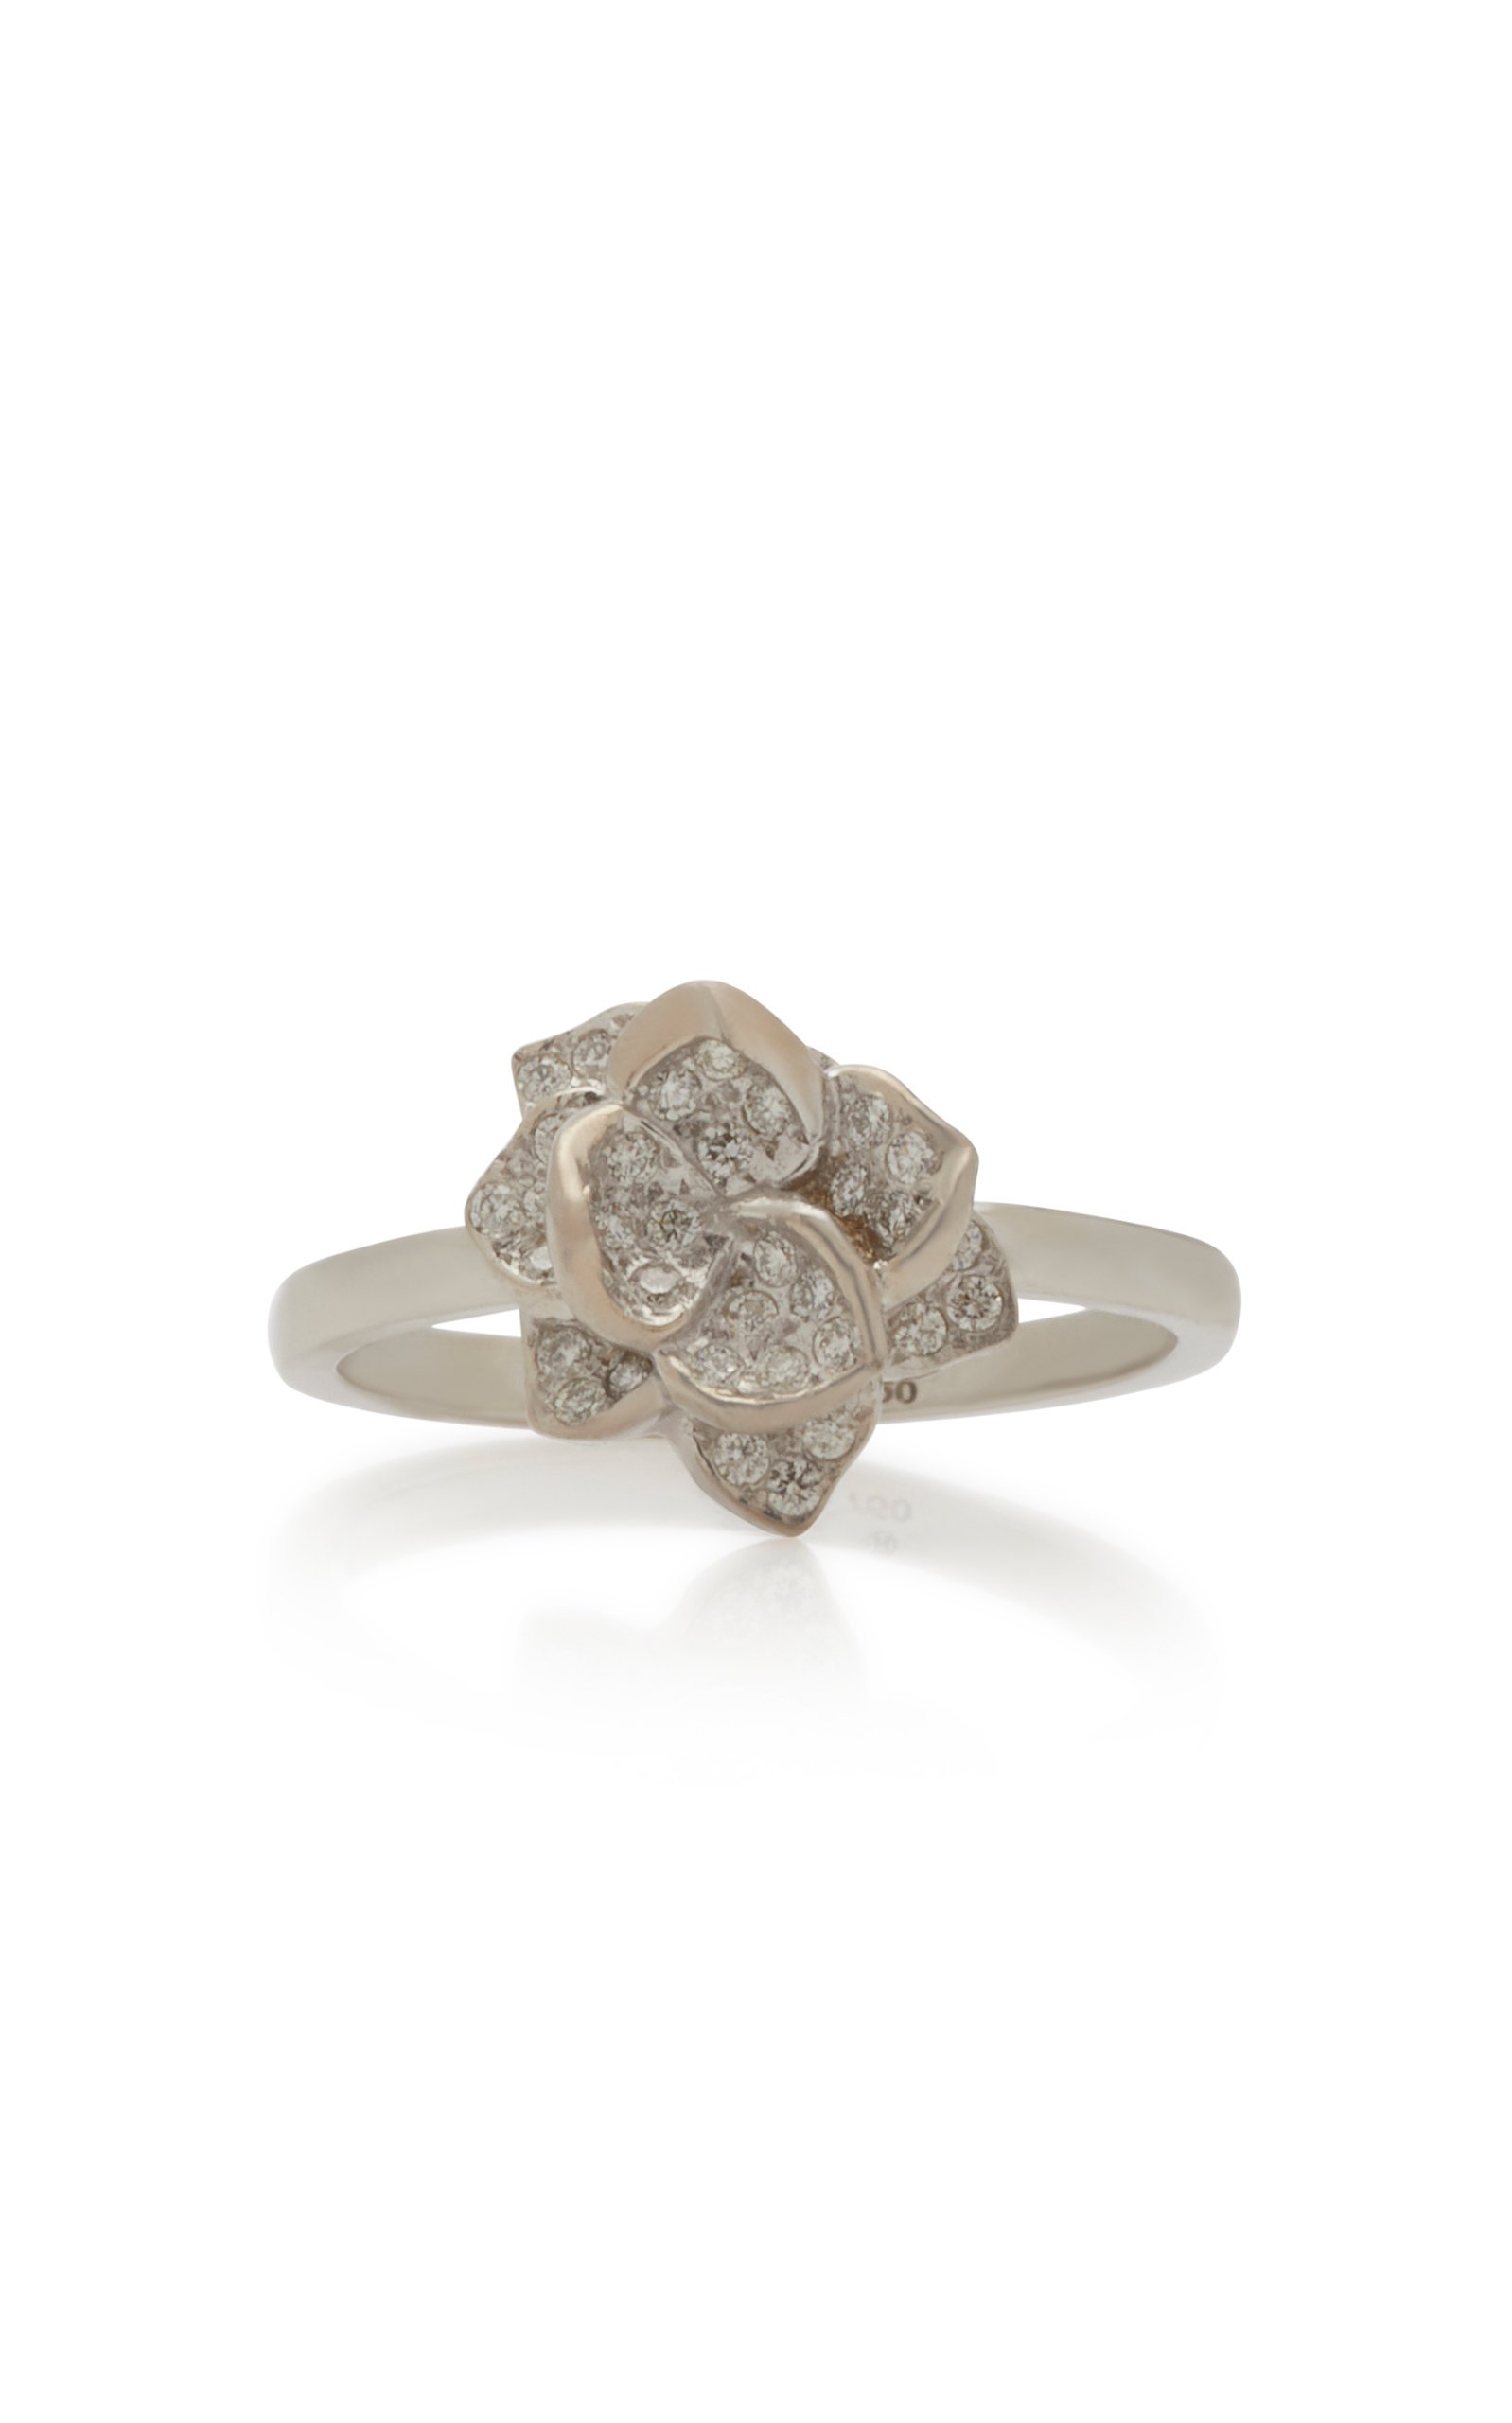 Colette Jewelry 18K White Gold Diamond Ring